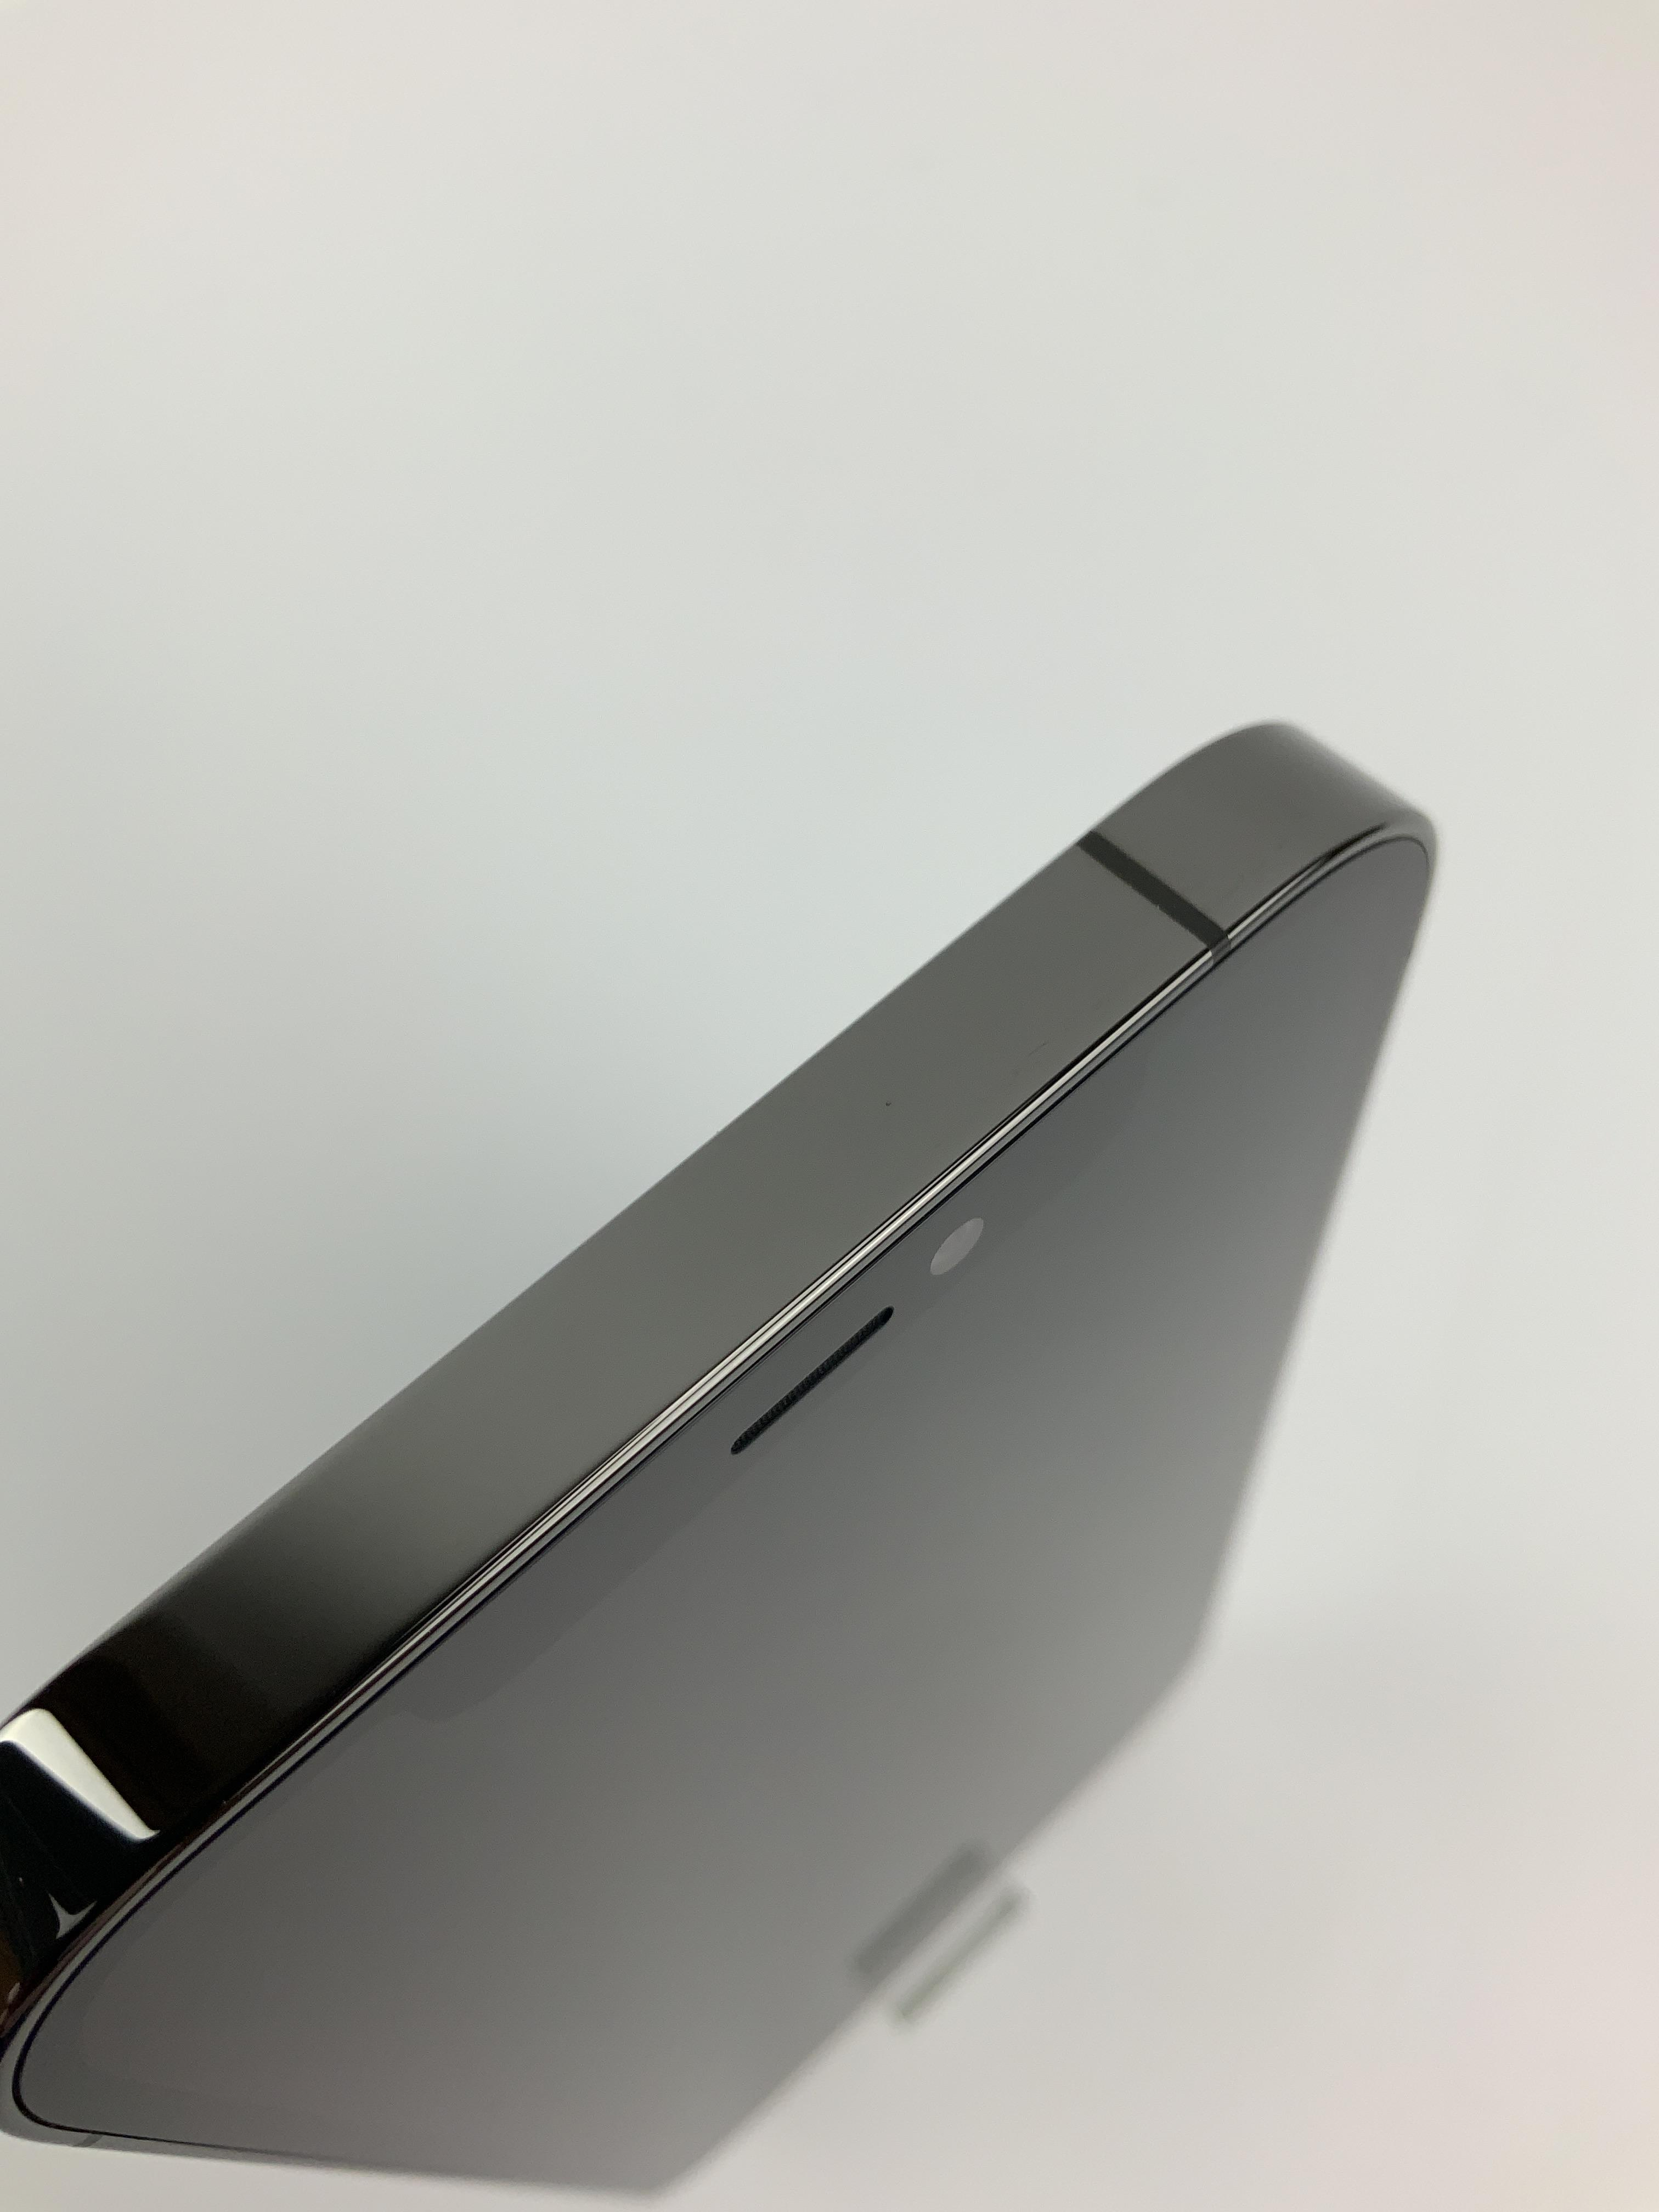 iPhone 12 Pro 256GB, 256GB, Graphite, Afbeelding 4